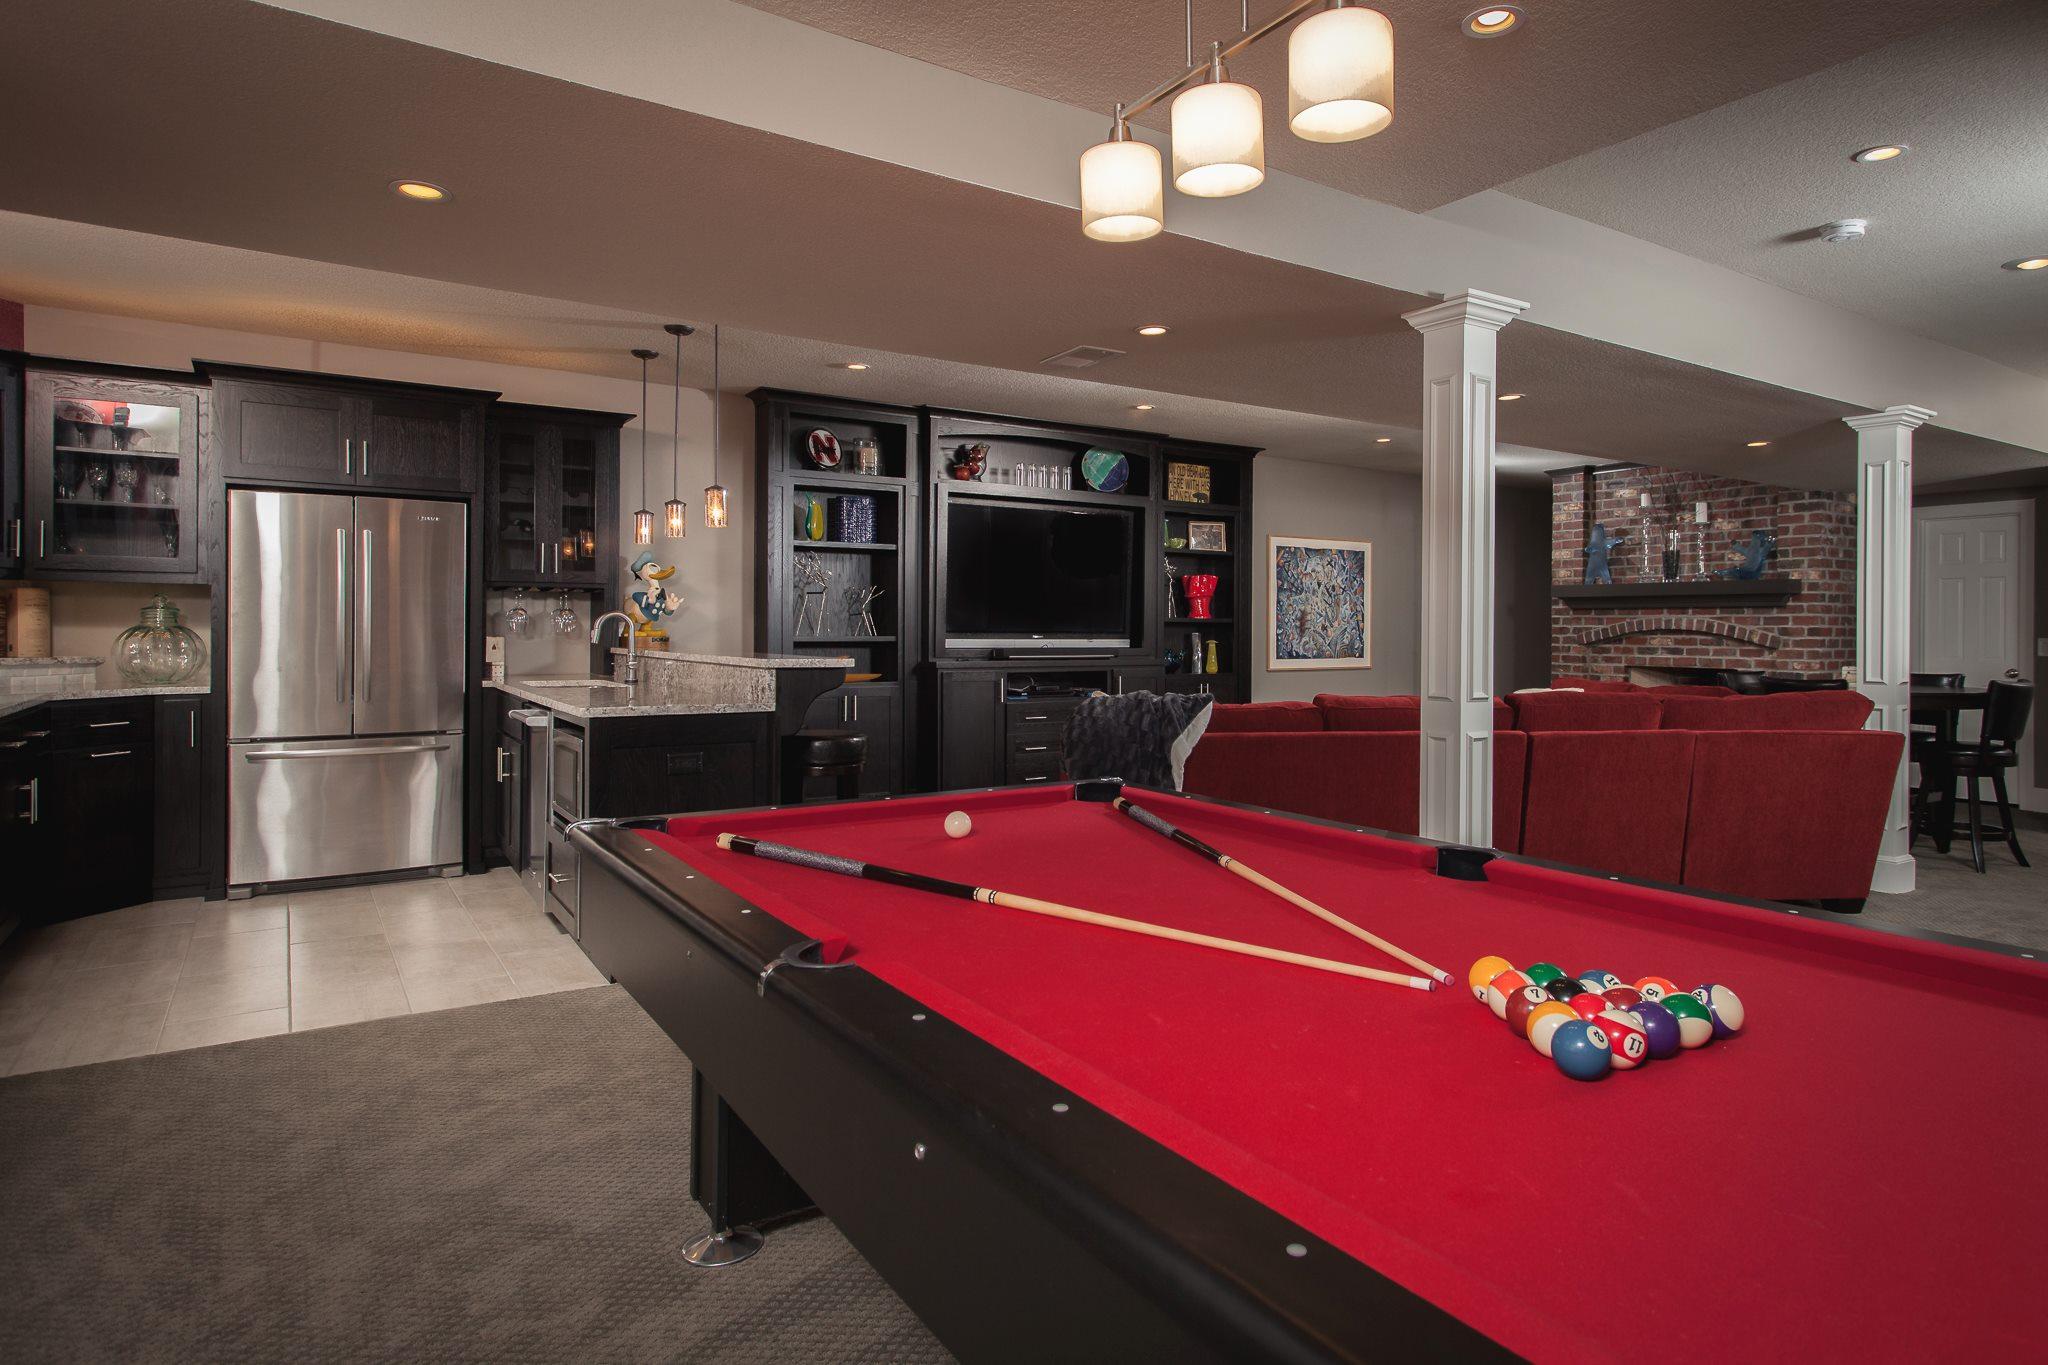 basement game room kitchen bar